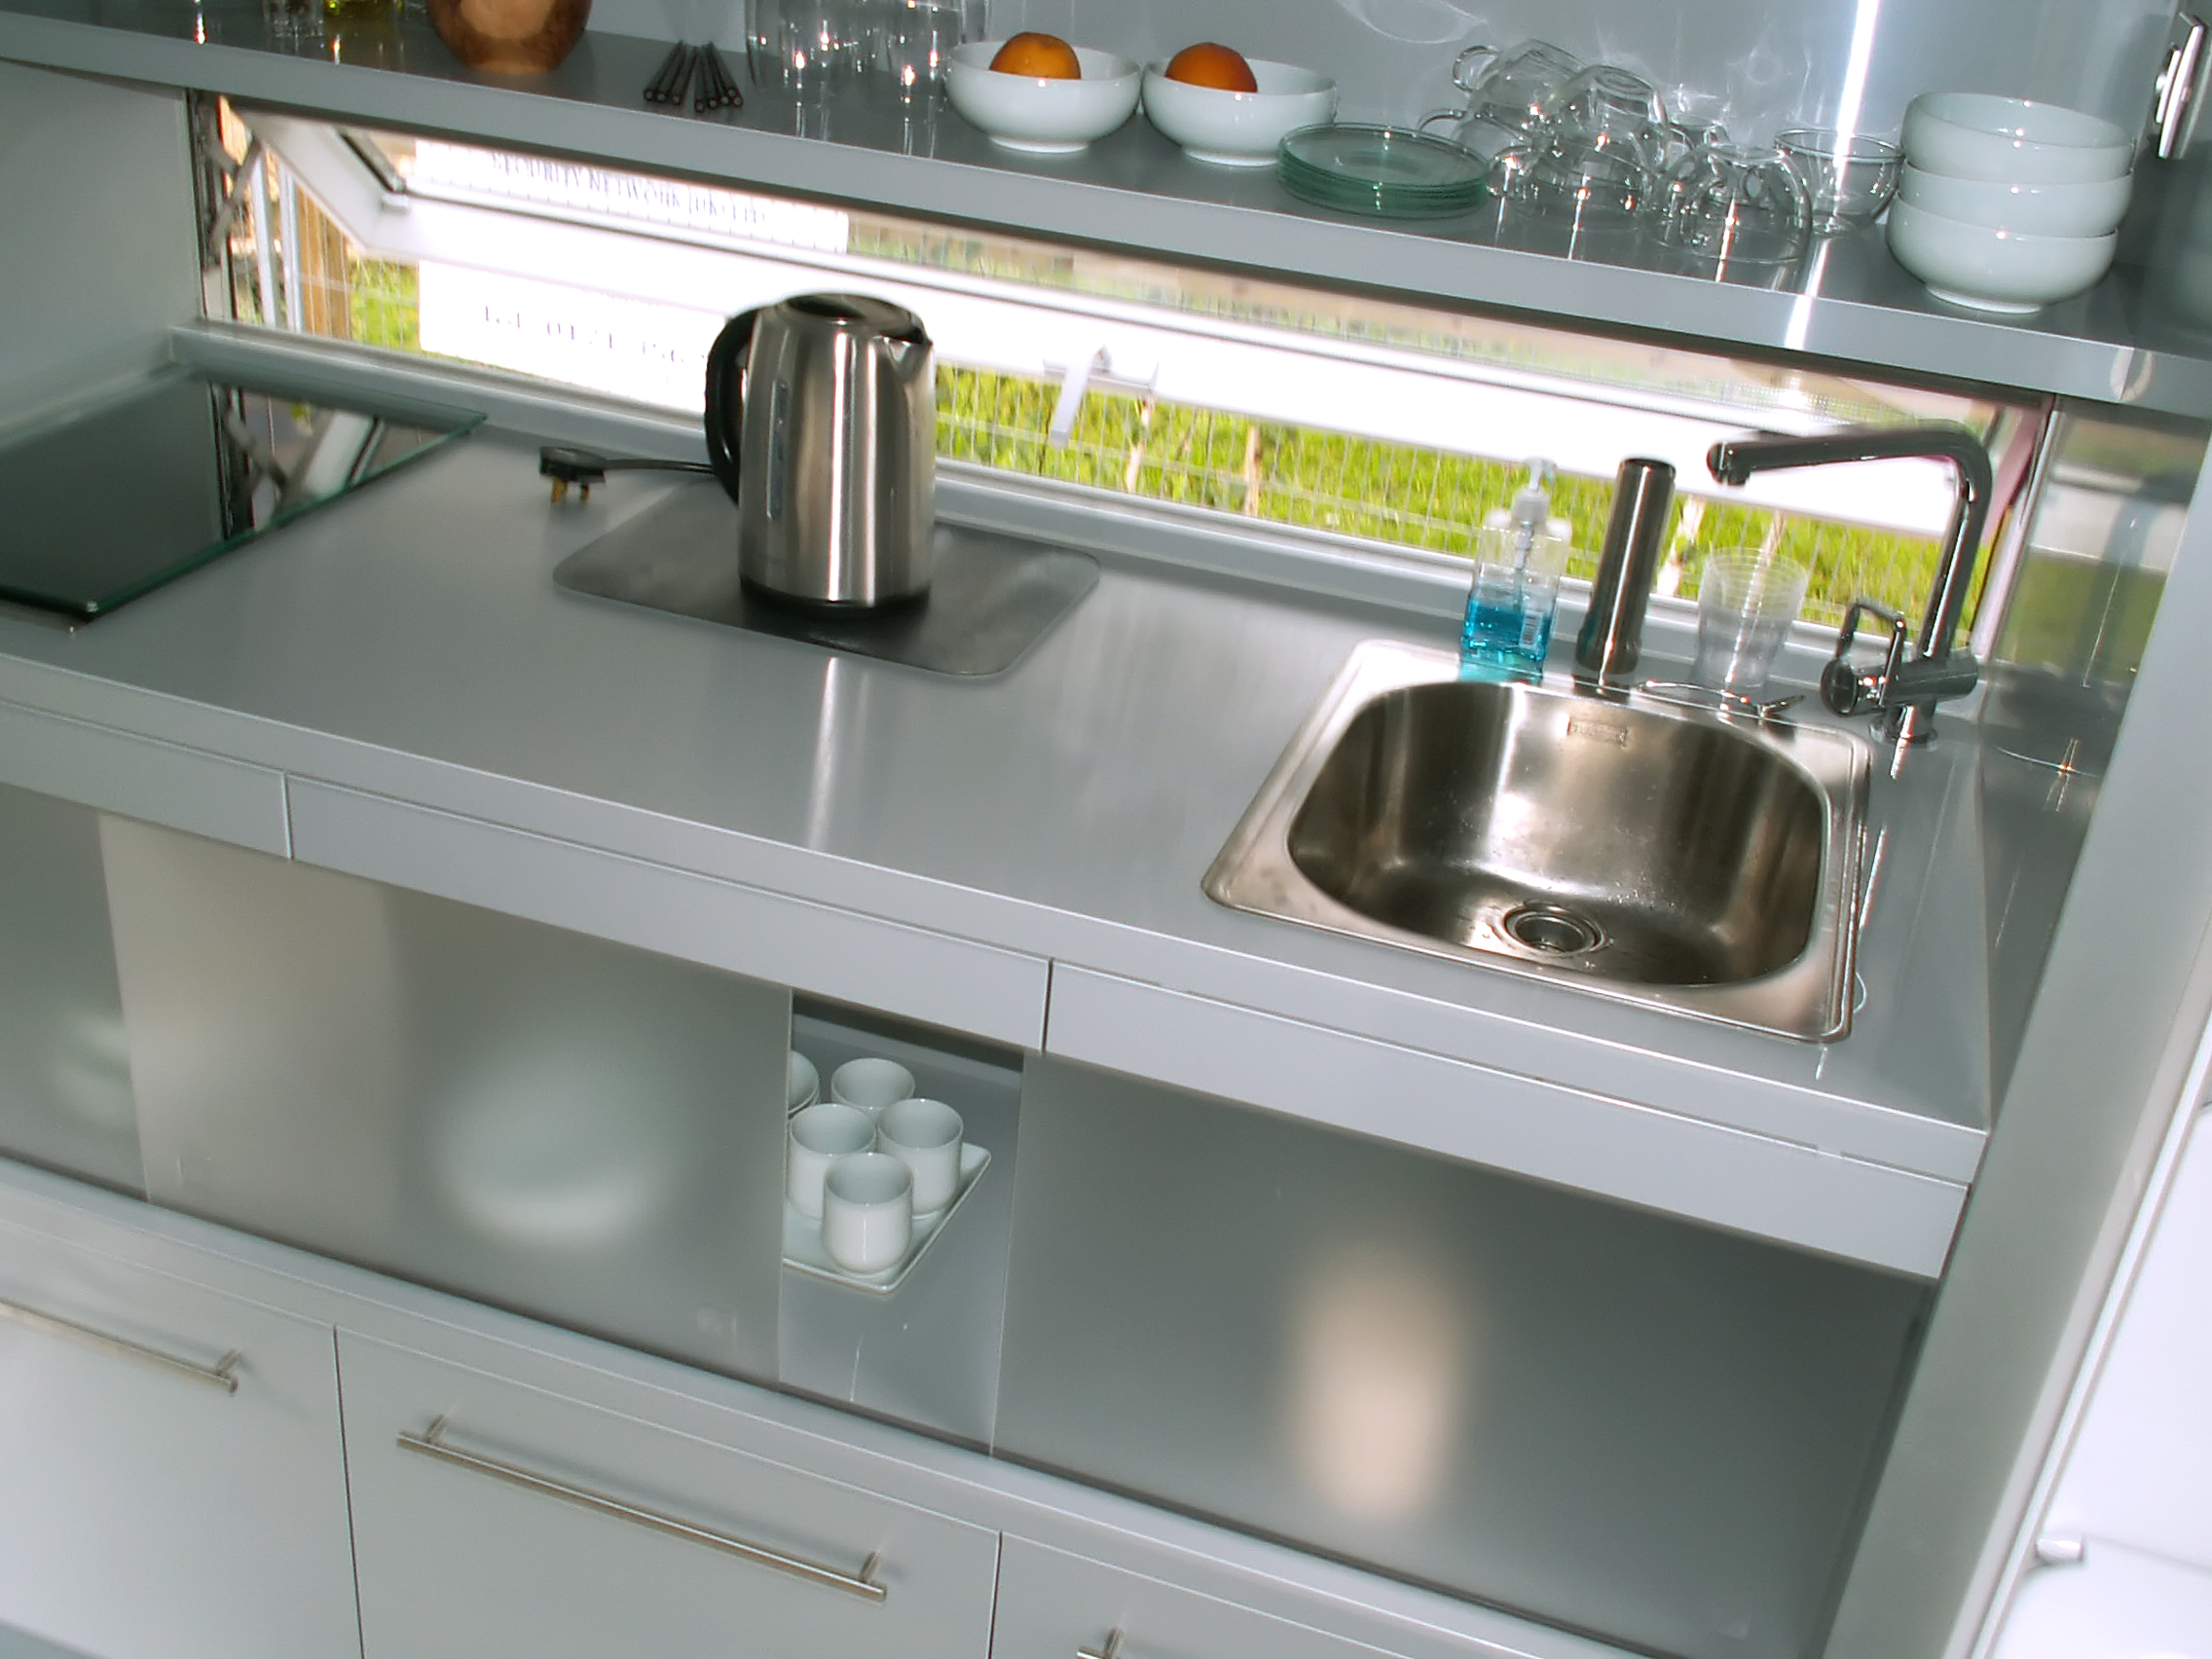 Kitchen Sink Not Draining But Not Blocked